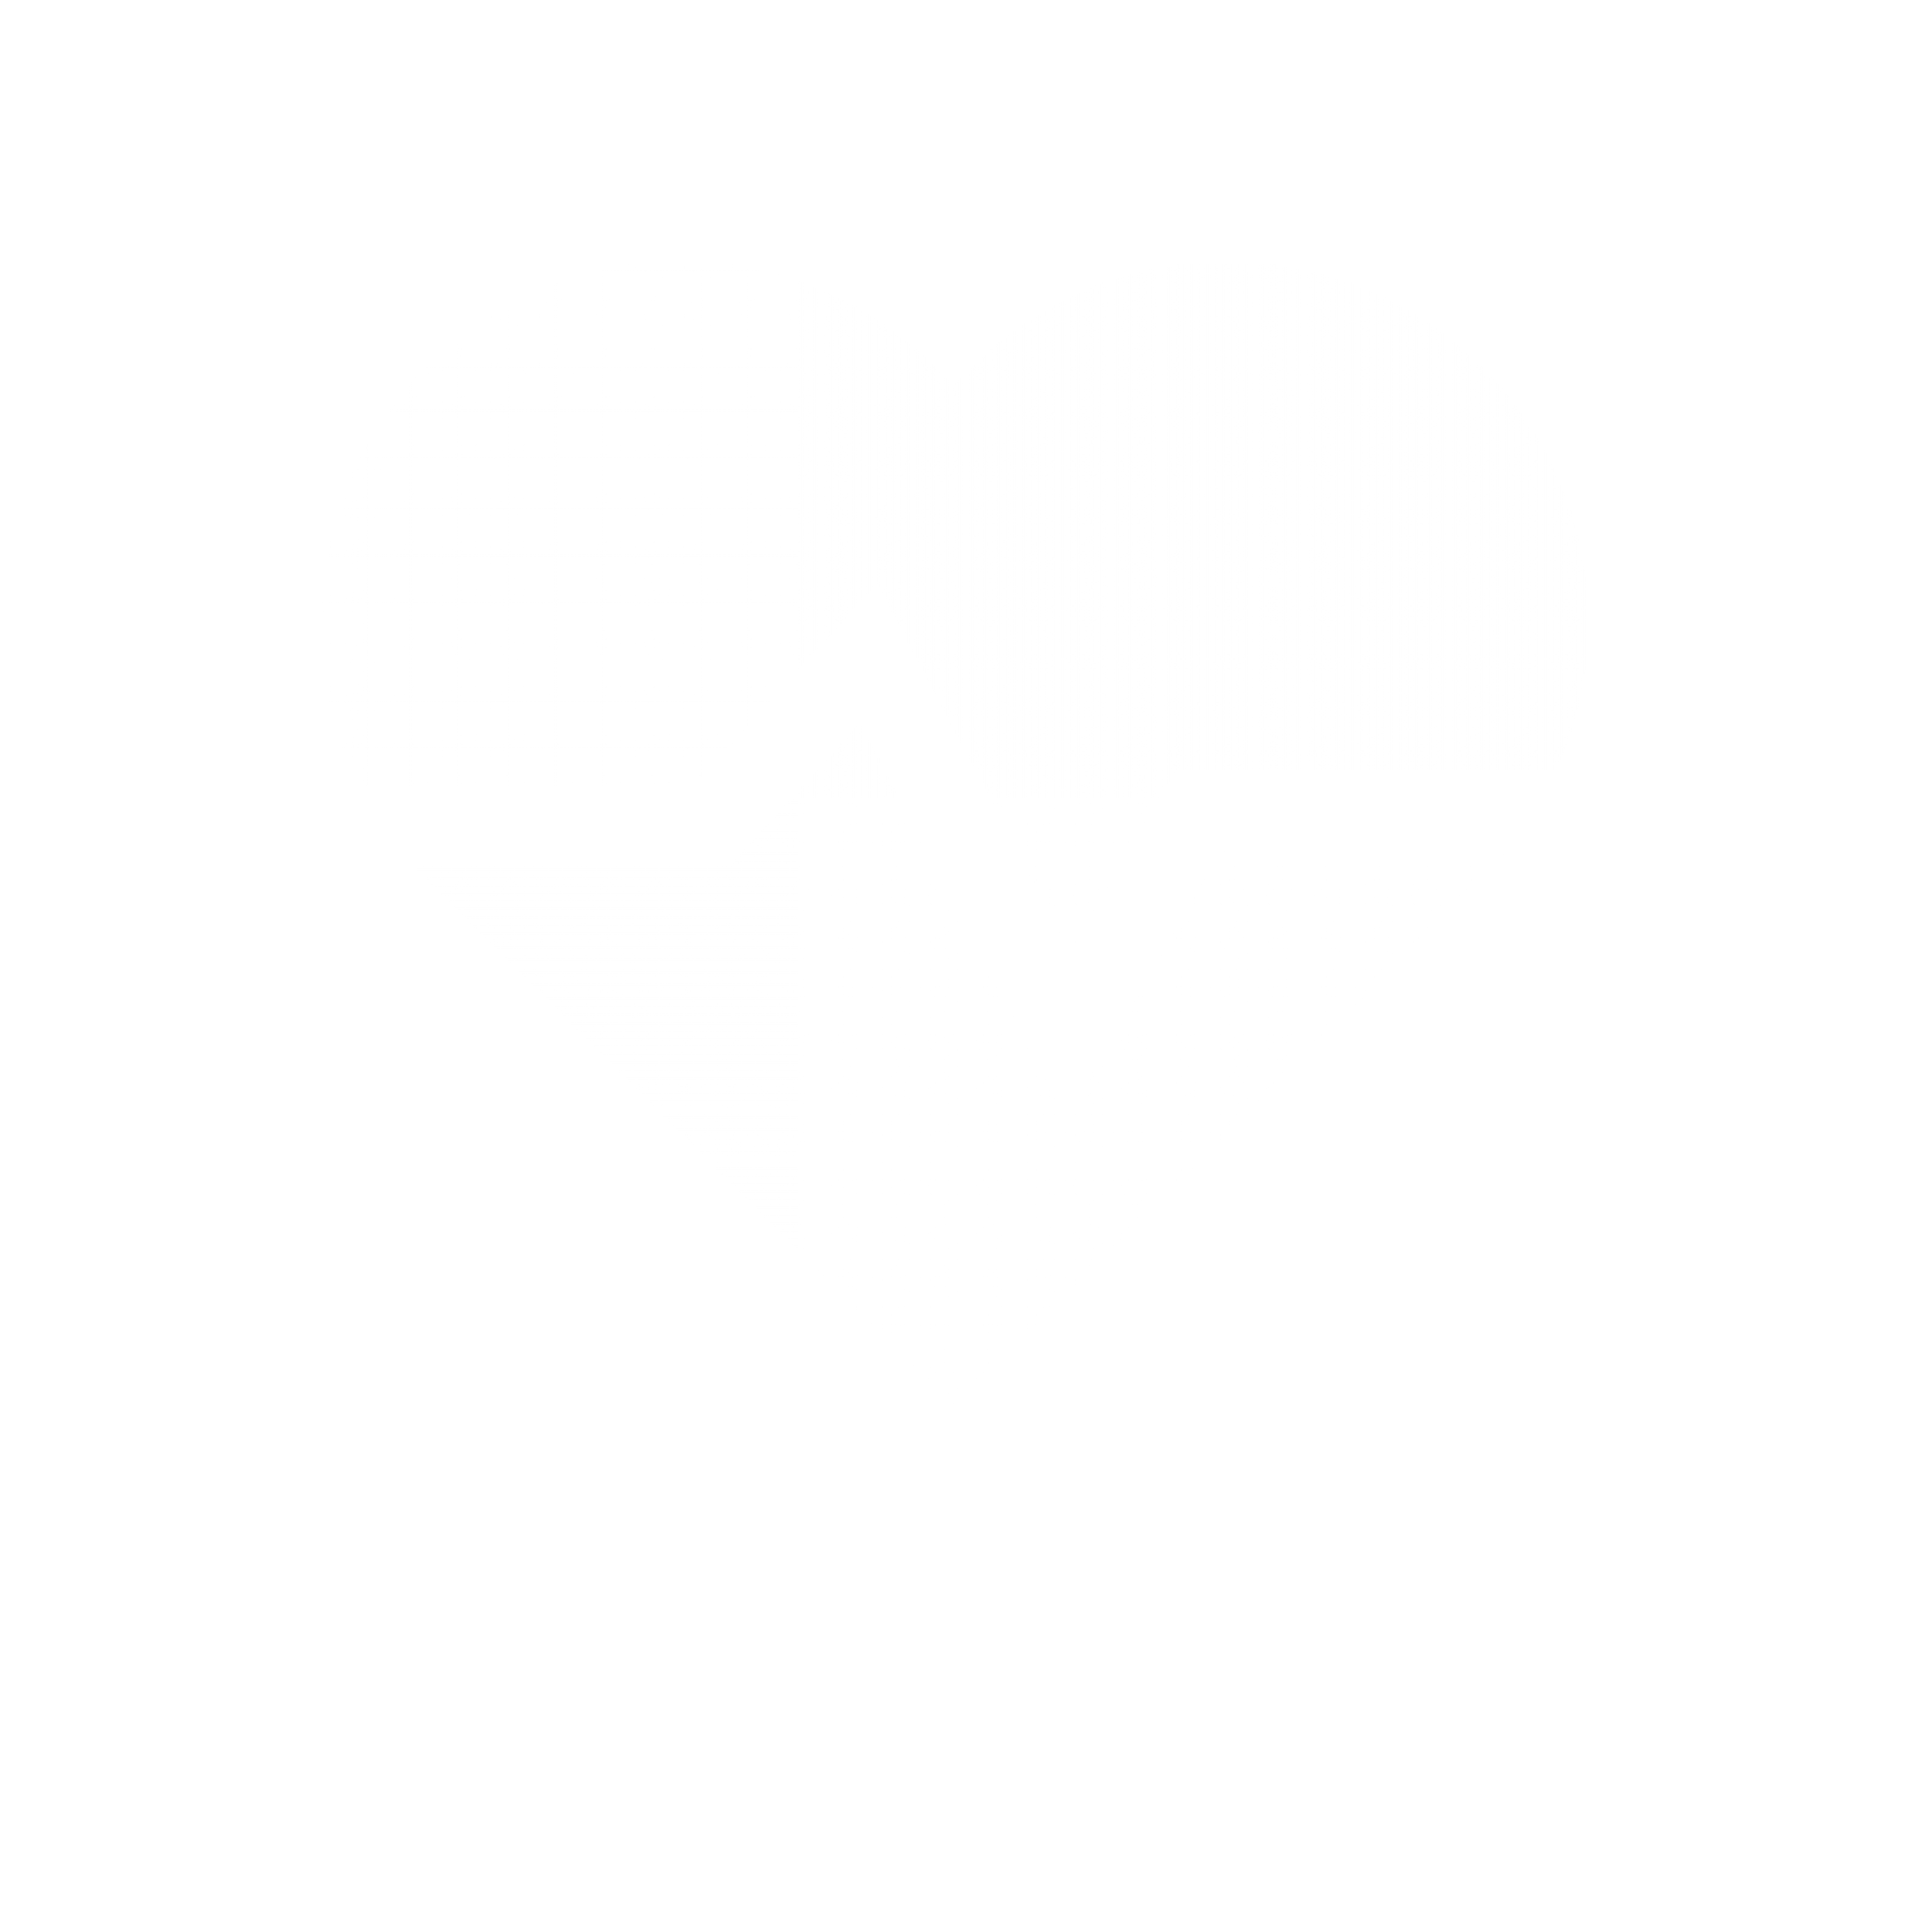 health screening services gp family medicine icon page